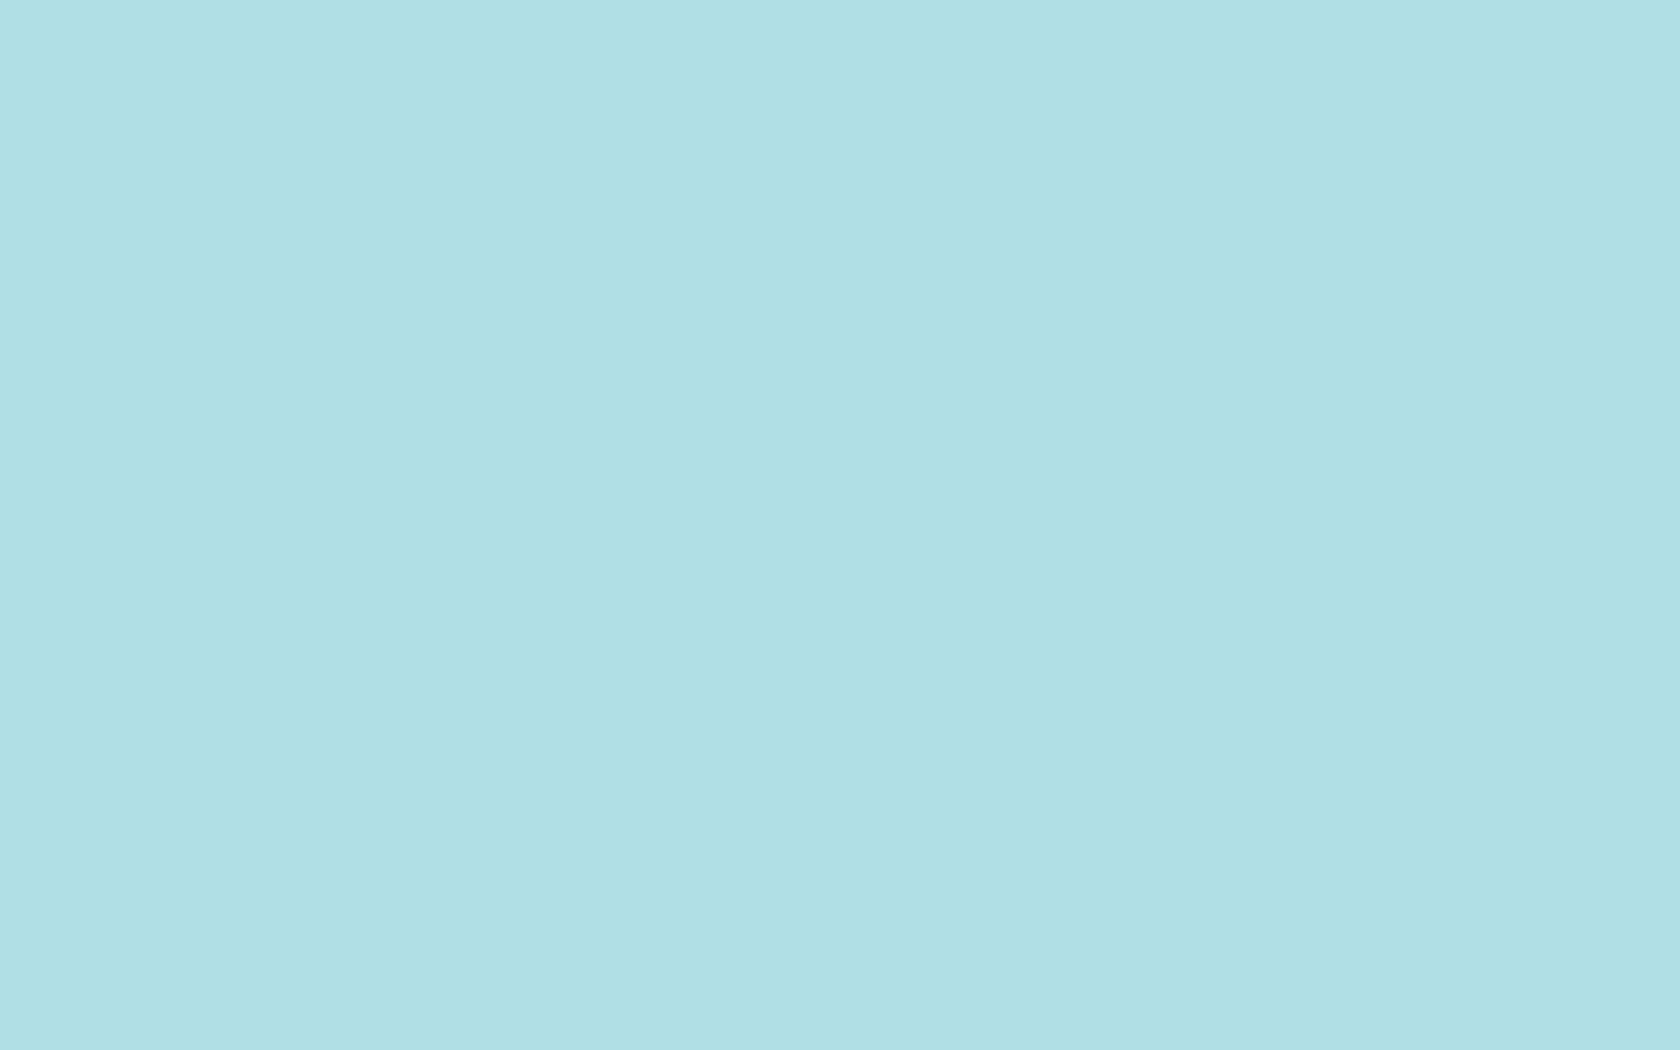 1680x1050 Powder Blue Web Solid Color Background